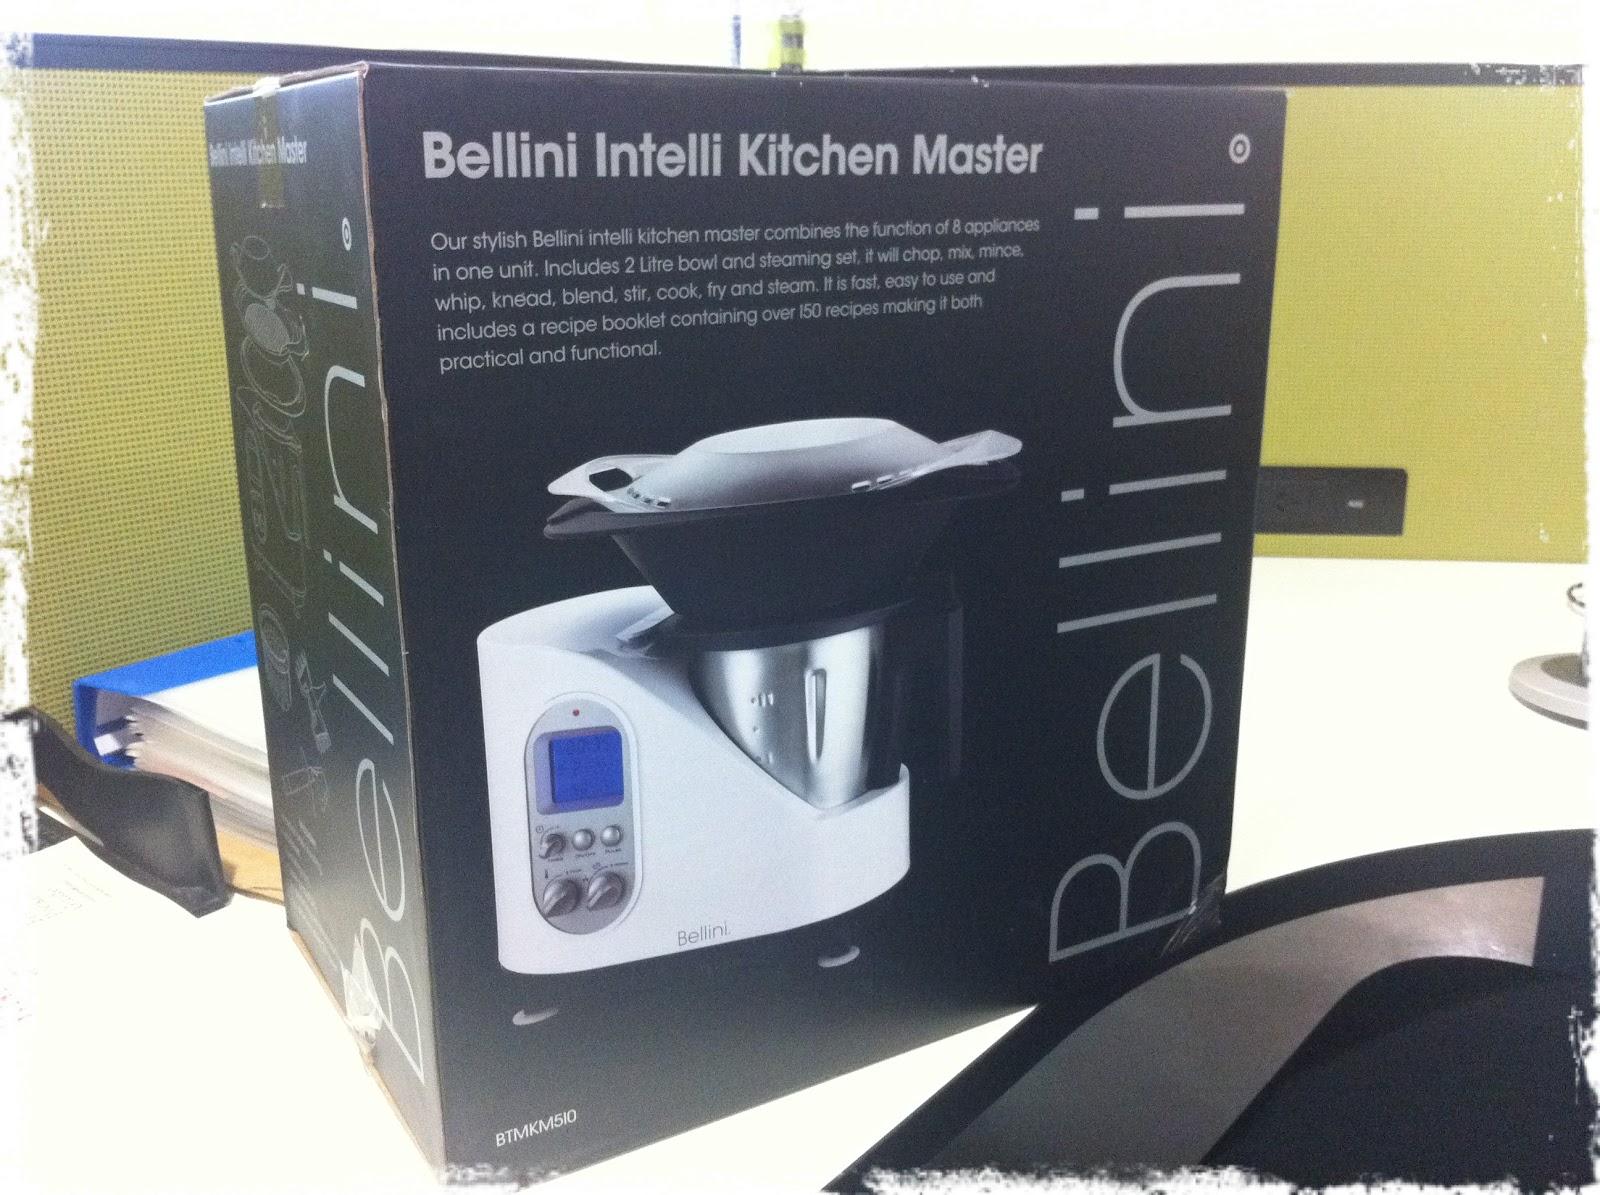 Bellini Intelli Kitchen Master   Available At Target!